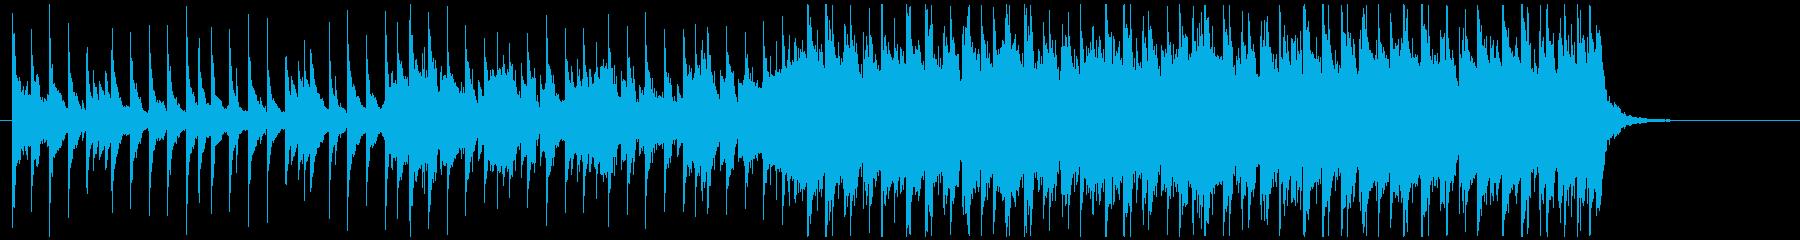 Mistrain / Intro's reproduced waveform